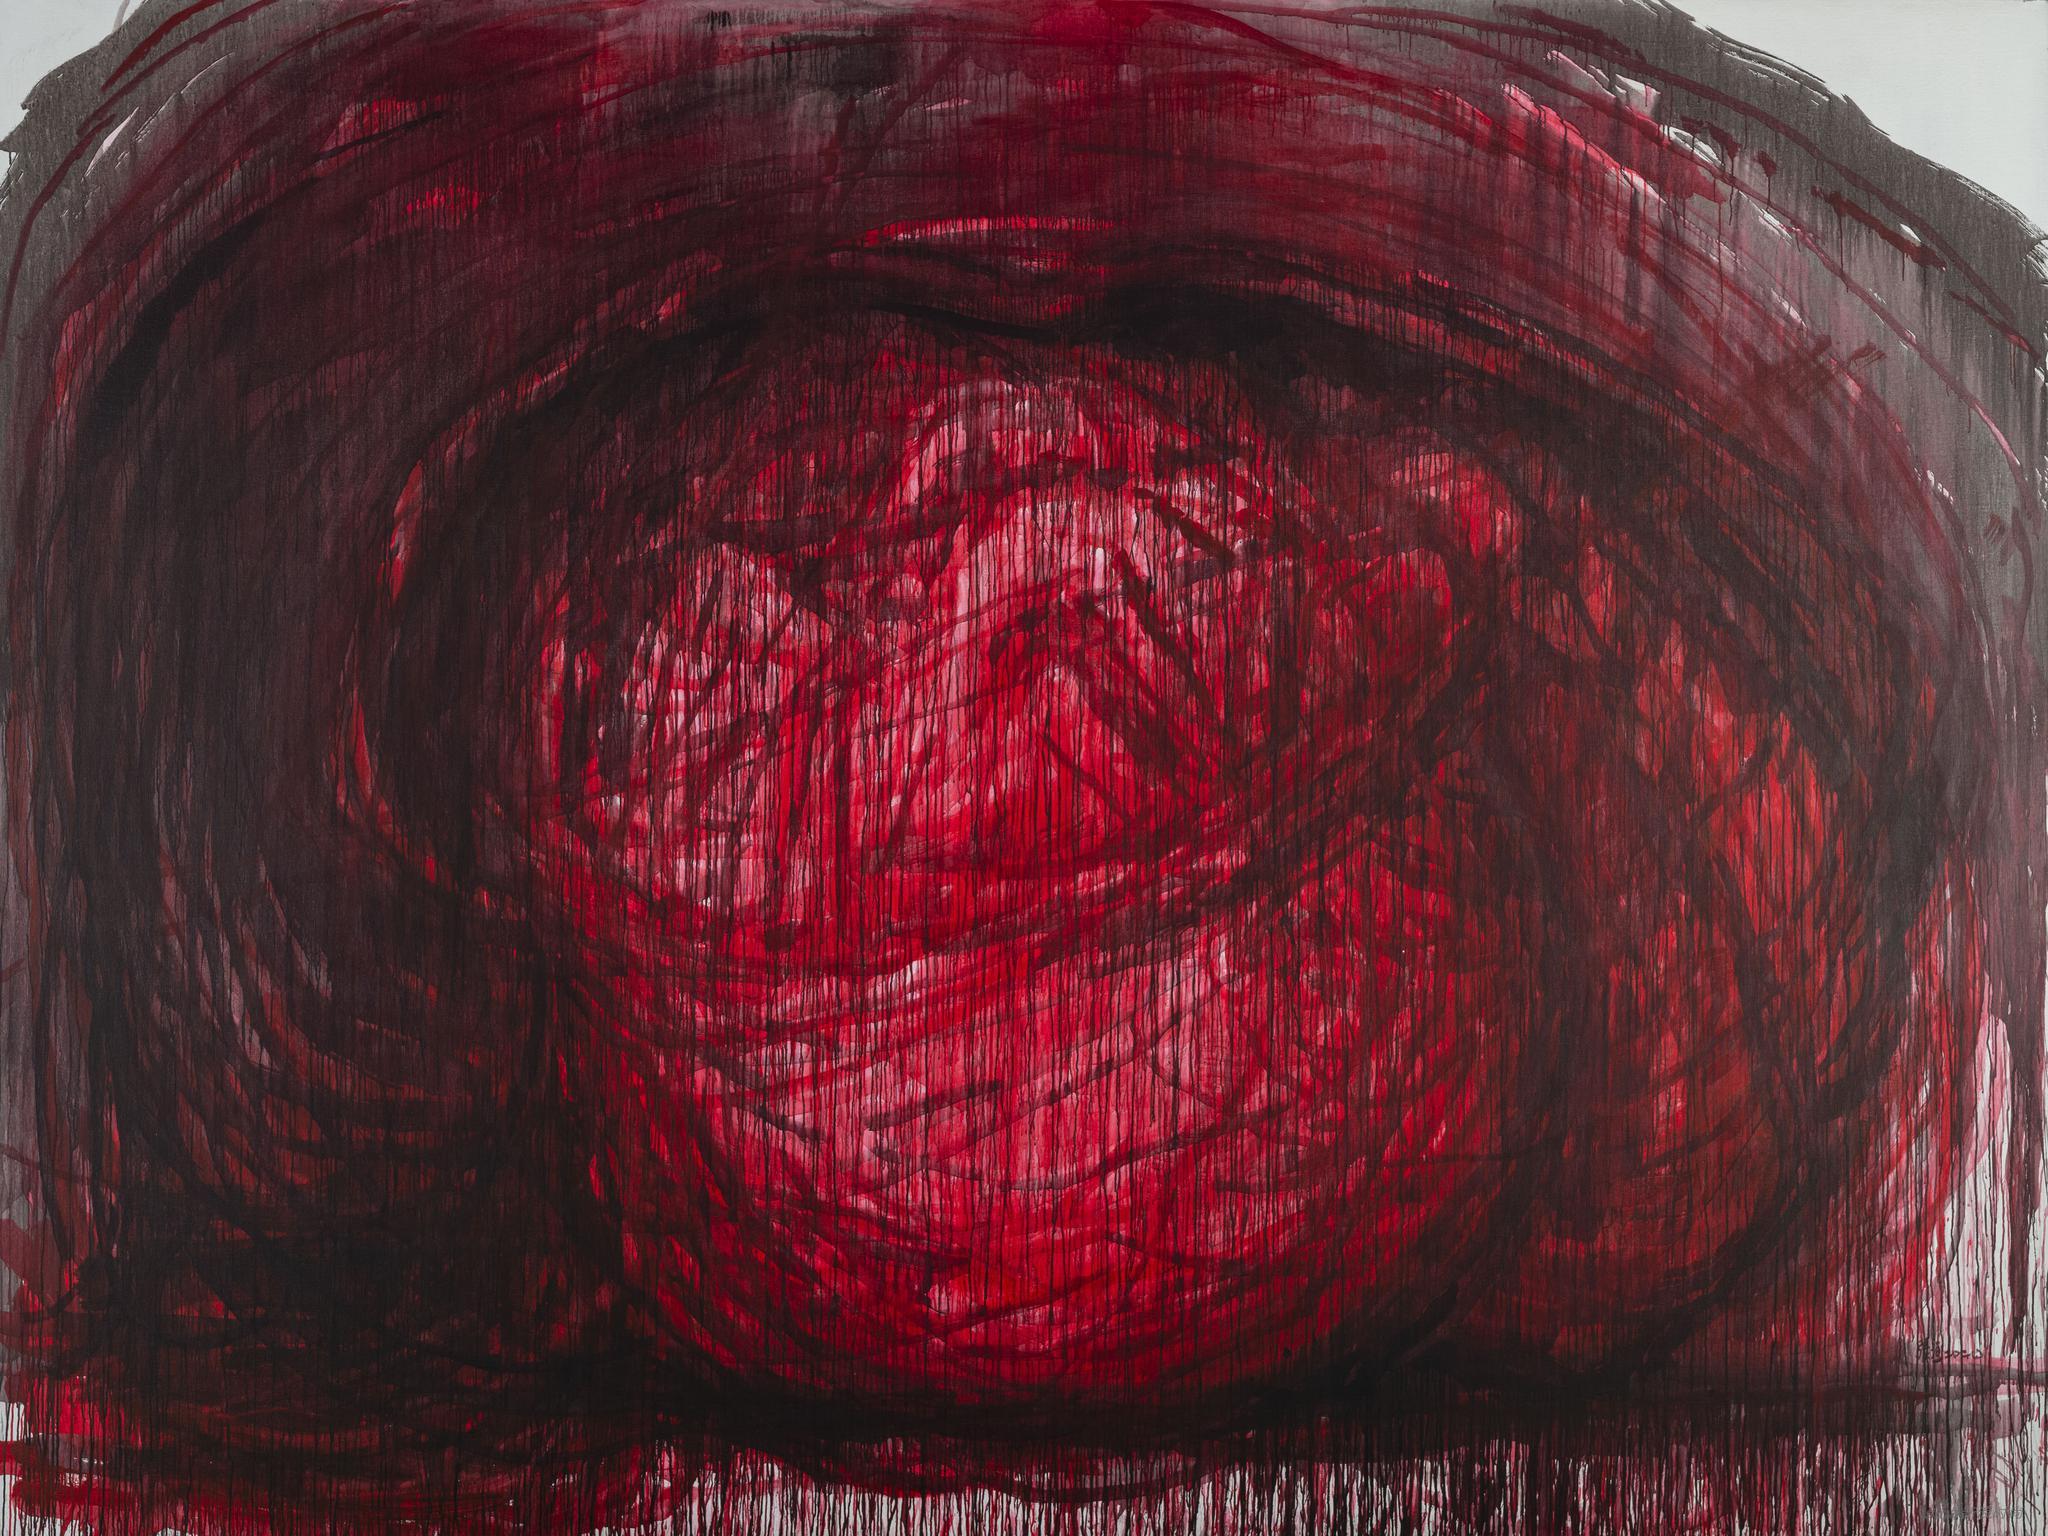 張洹, b.1965, Love No.7, 2020, Arcylic on Linen, 300 x 400 x 5 cm